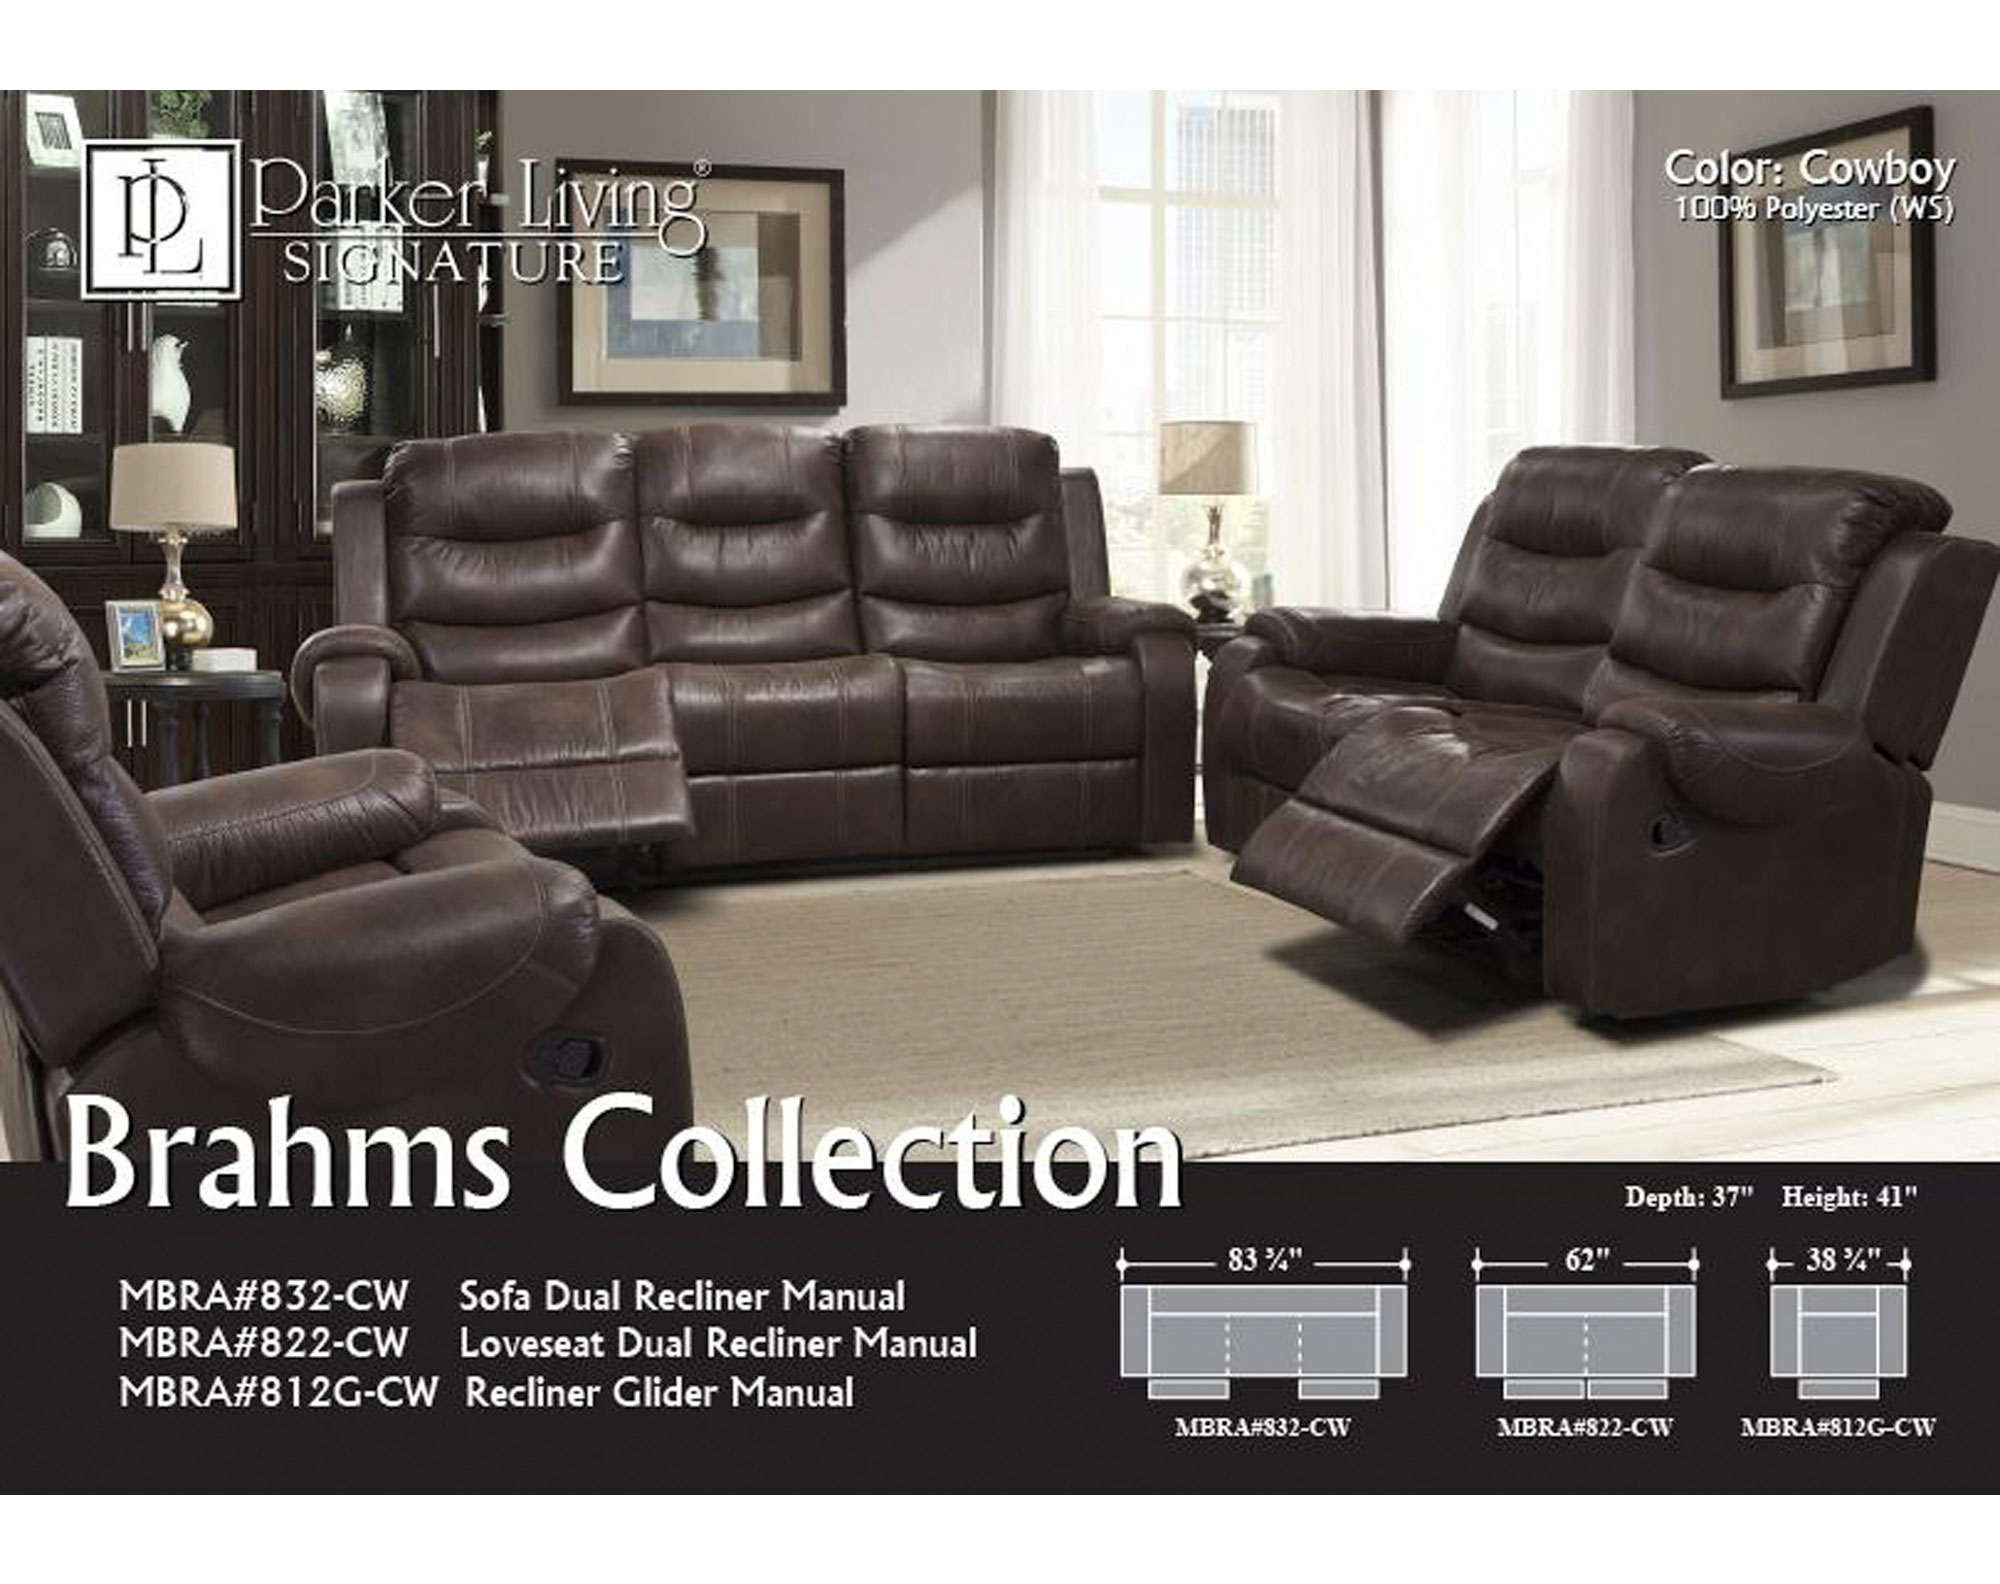 Stupendous Brahms Cowboy Double Reclining Sofa Sofas And Sectionals Spiritservingveterans Wood Chair Design Ideas Spiritservingveteransorg